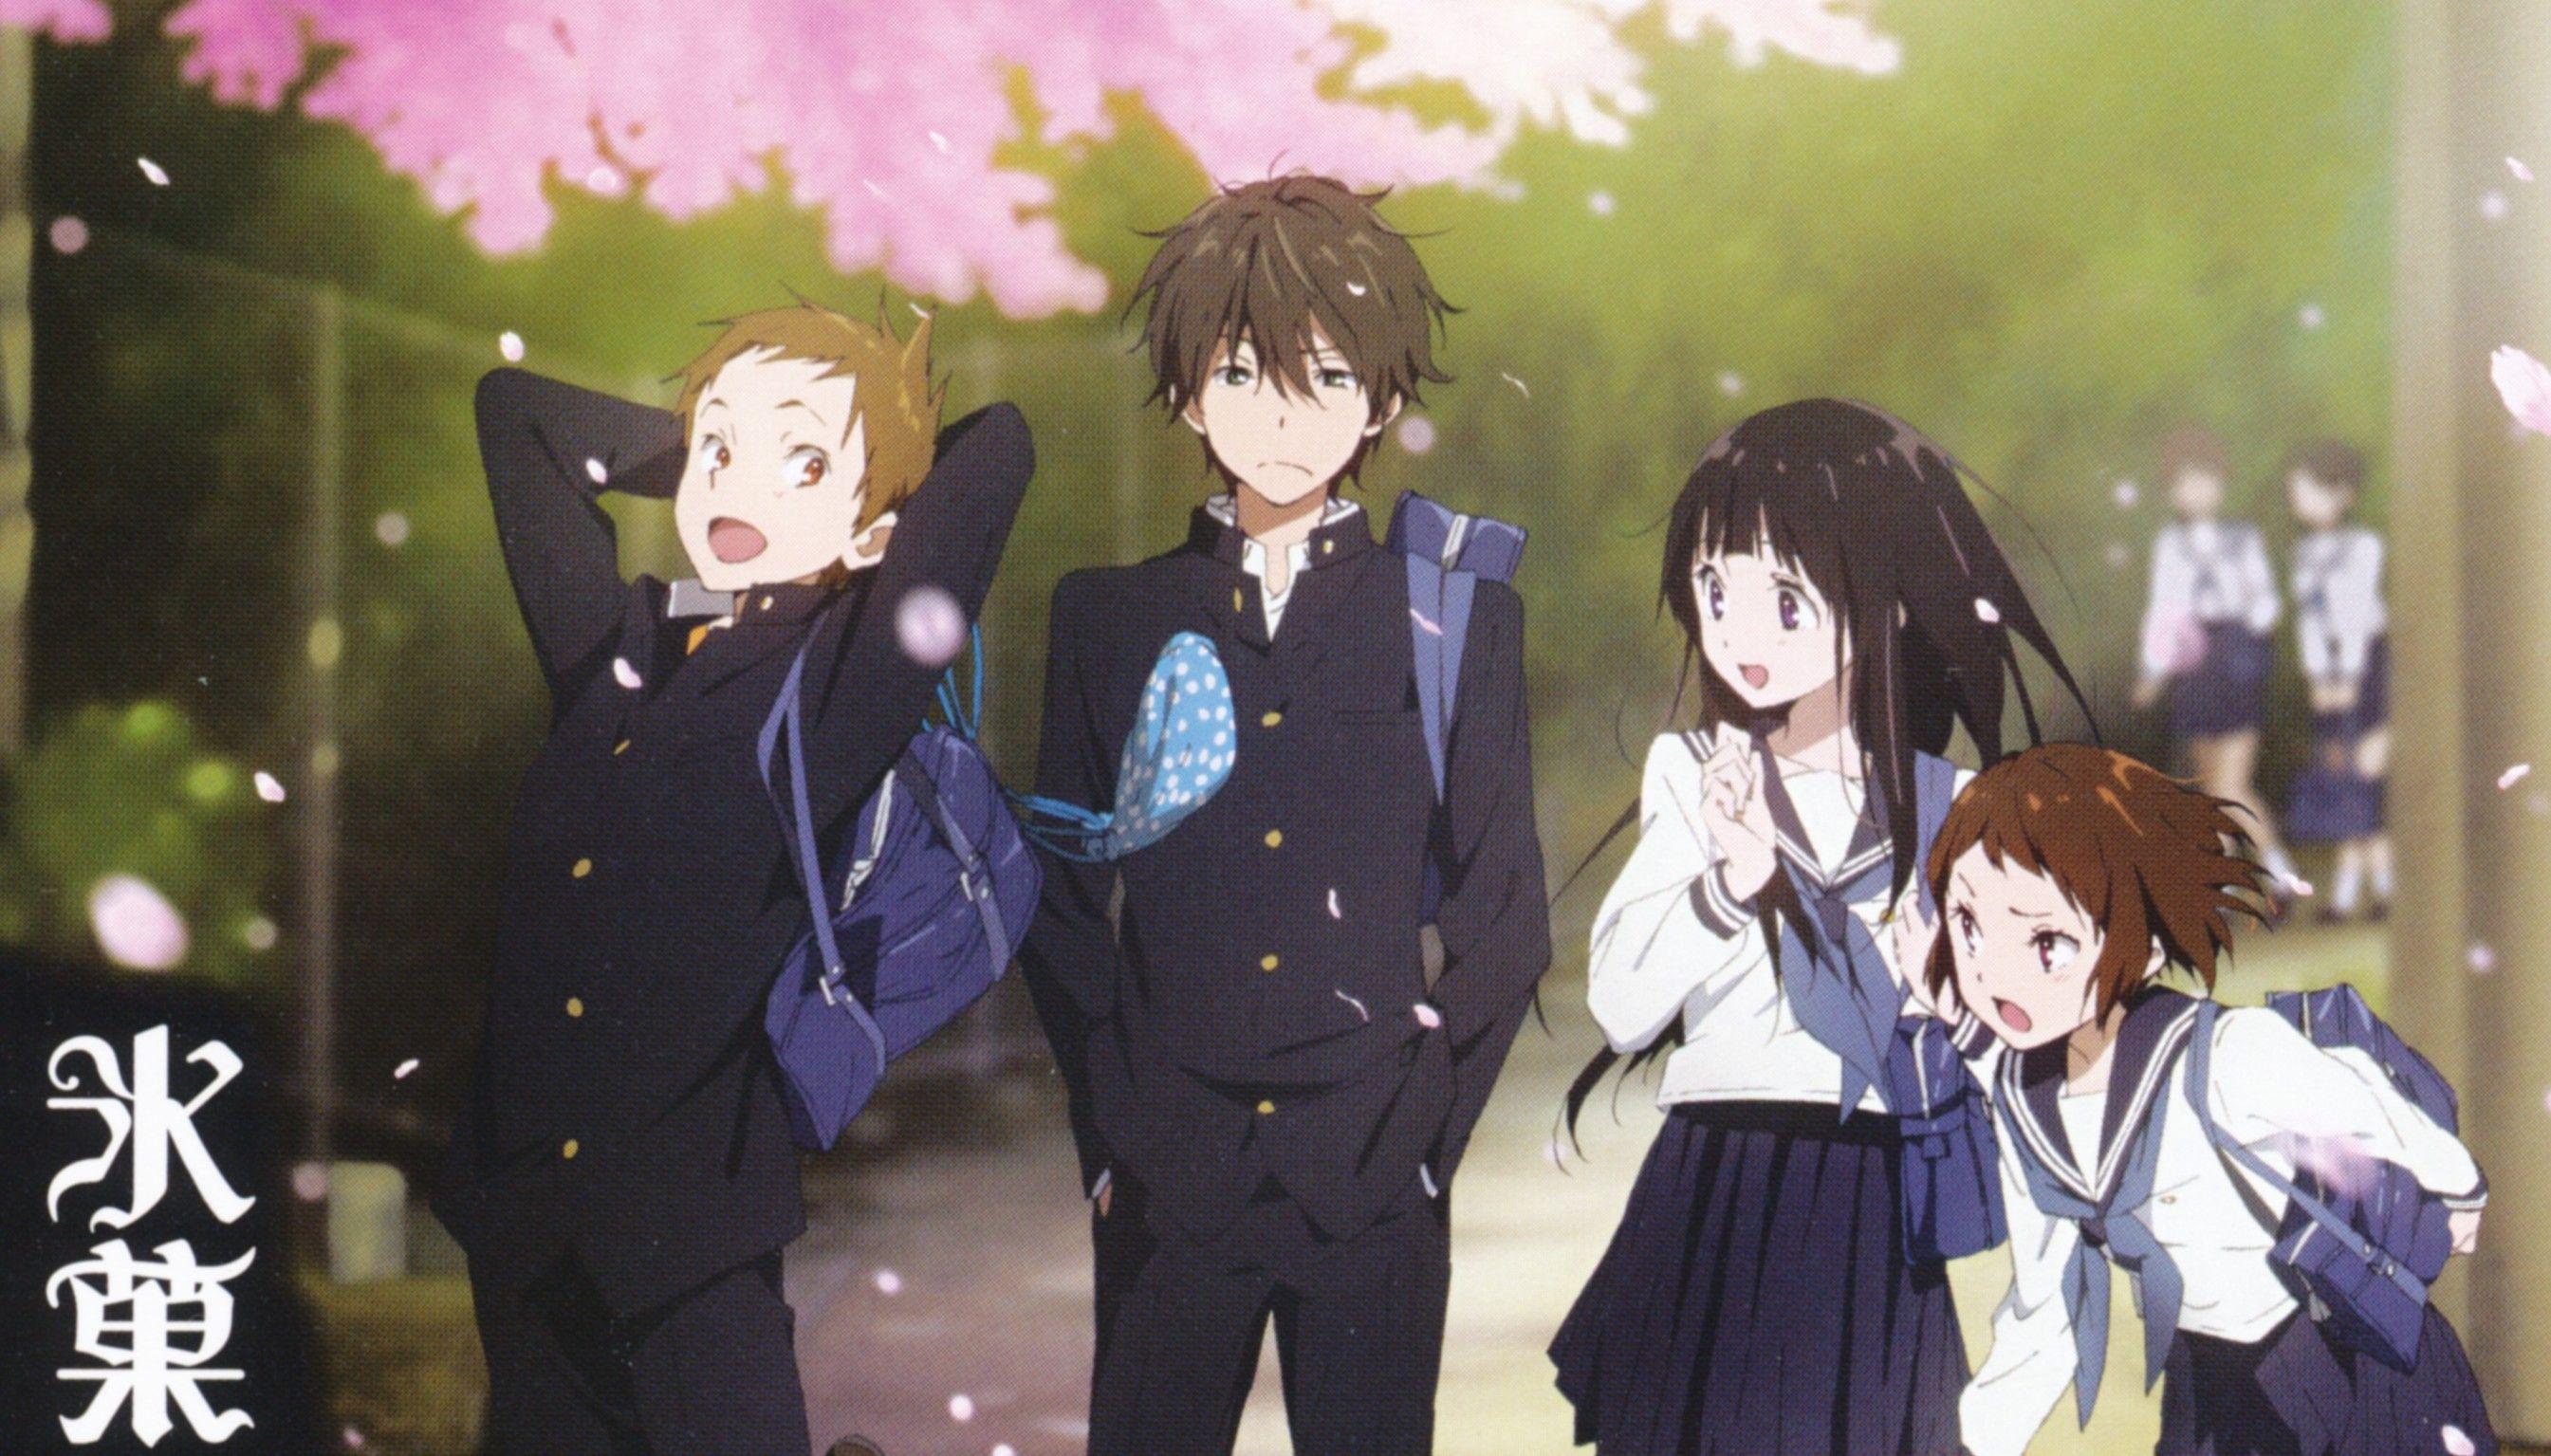 Hyouka 480p + 720p Anime, Imagenes de